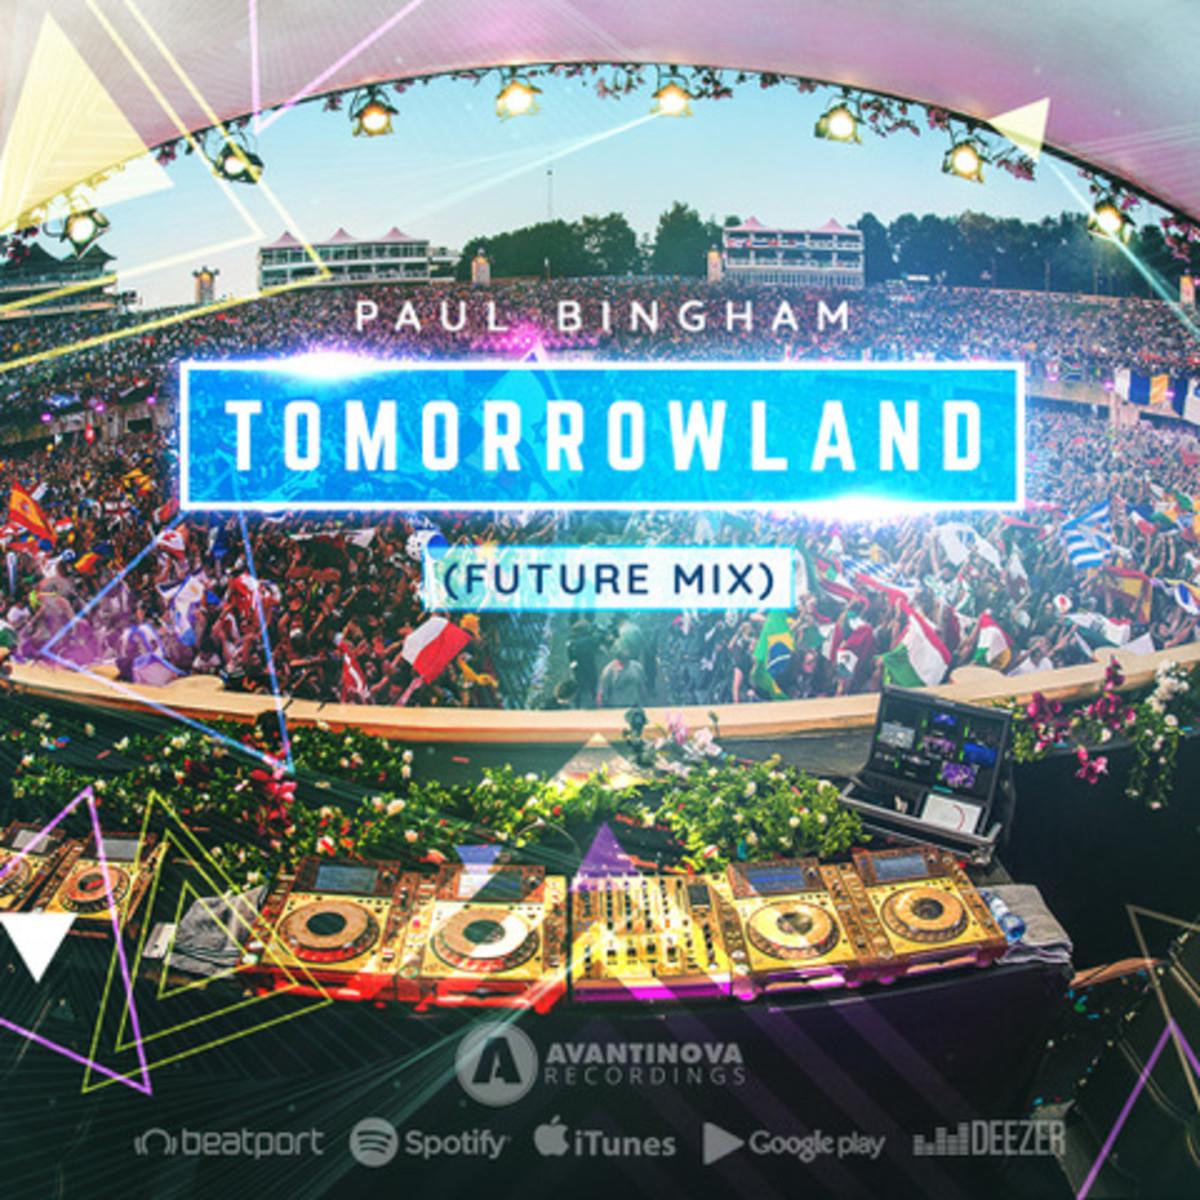 Paul Bingham - Tomorrowland (Future Mix) -- ALBUM ARTWORK